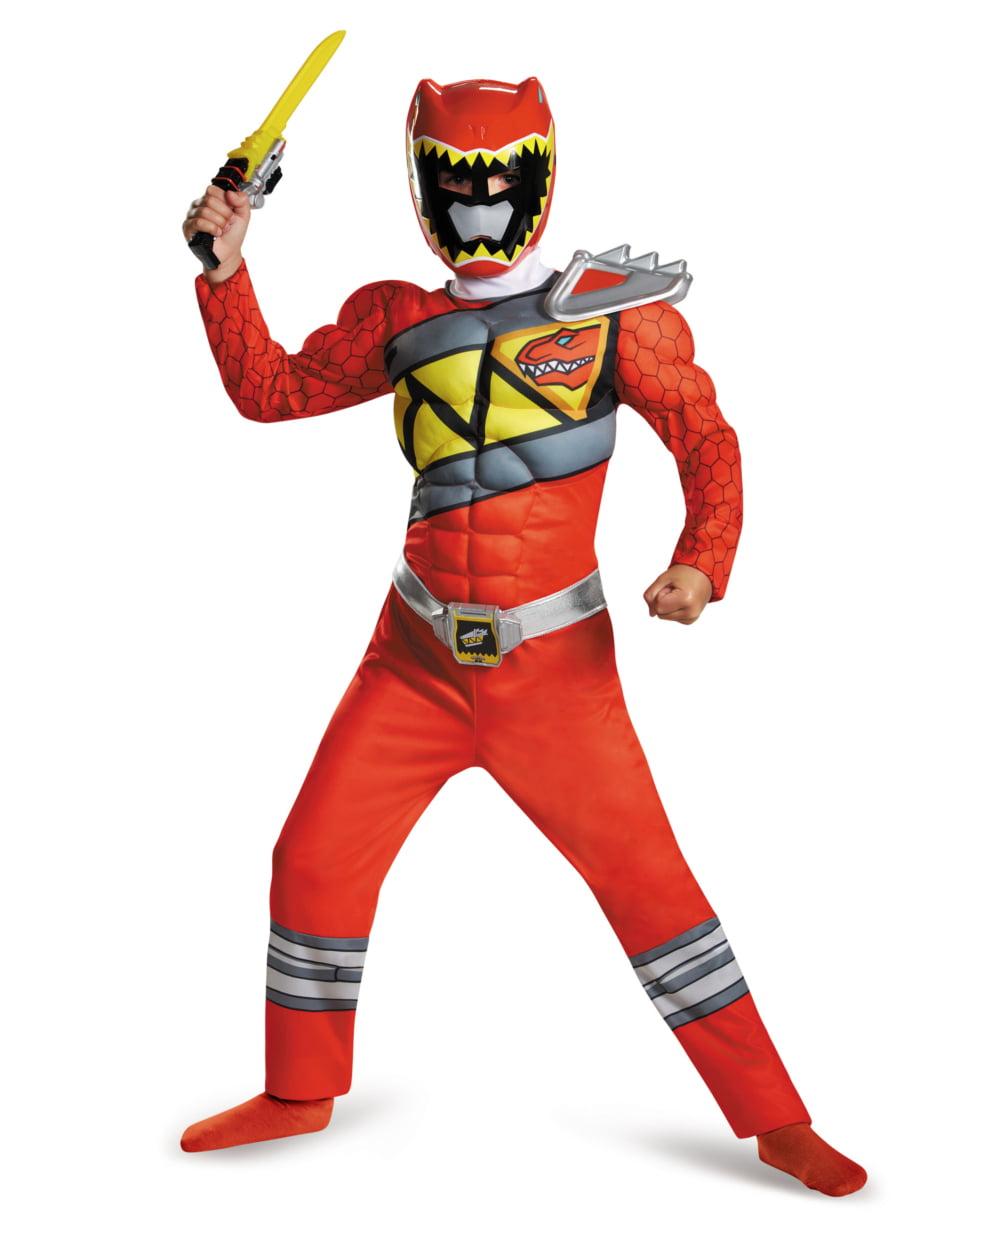 Red Power Ranger Dino Charge Classic Muscle Child Halloween Costume - Walmart.com  sc 1 st  Walmart & Red Power Ranger Dino Charge Classic Muscle Child Halloween Costume ...